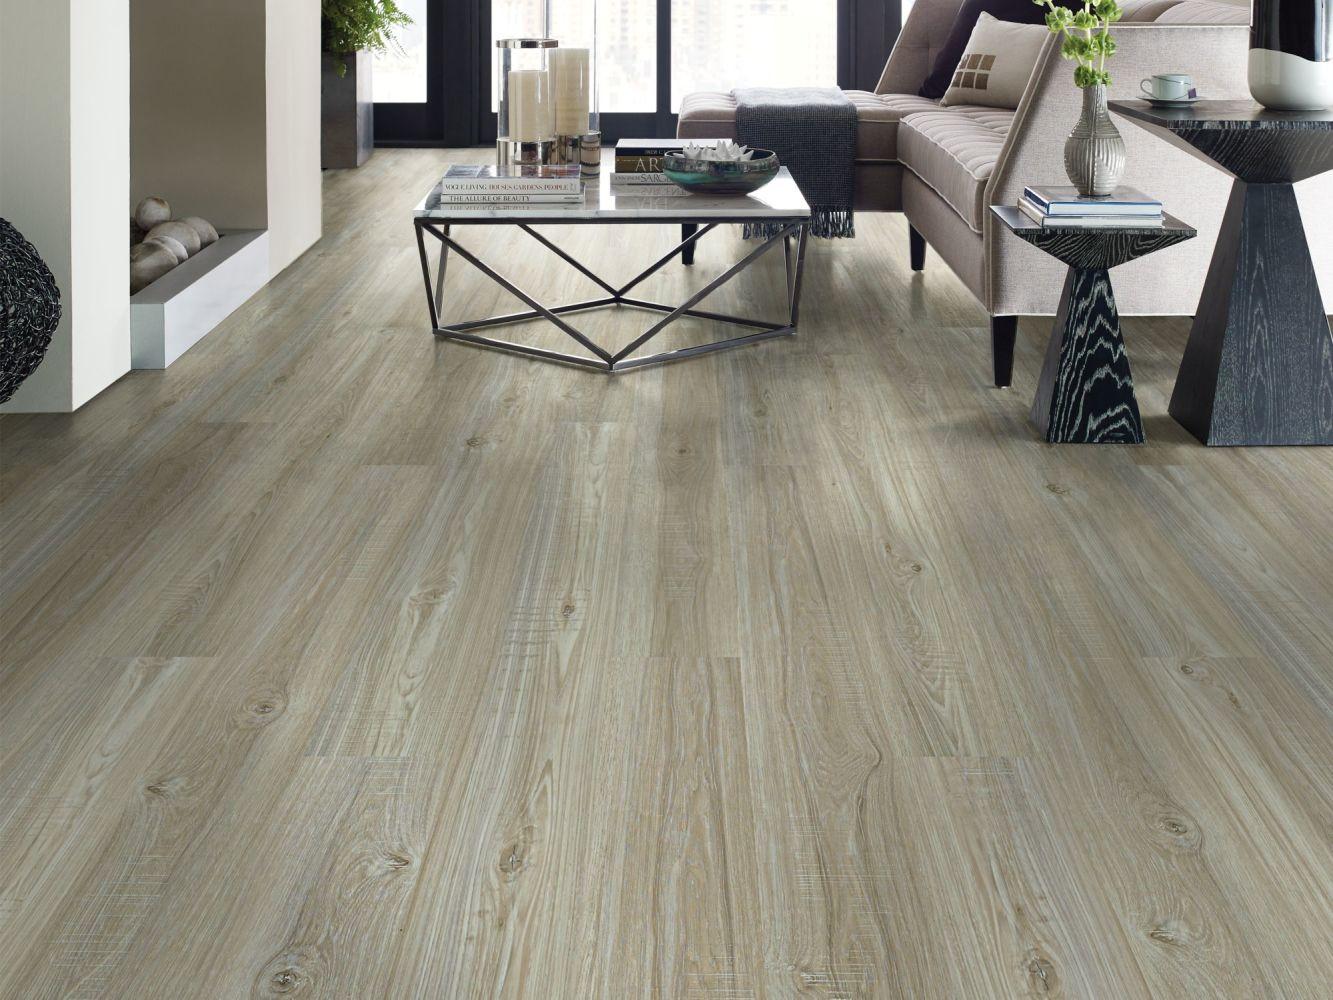 Shaw Floors Vinyl Property Solutions Presto Plus Washed Oak 00509_VE284